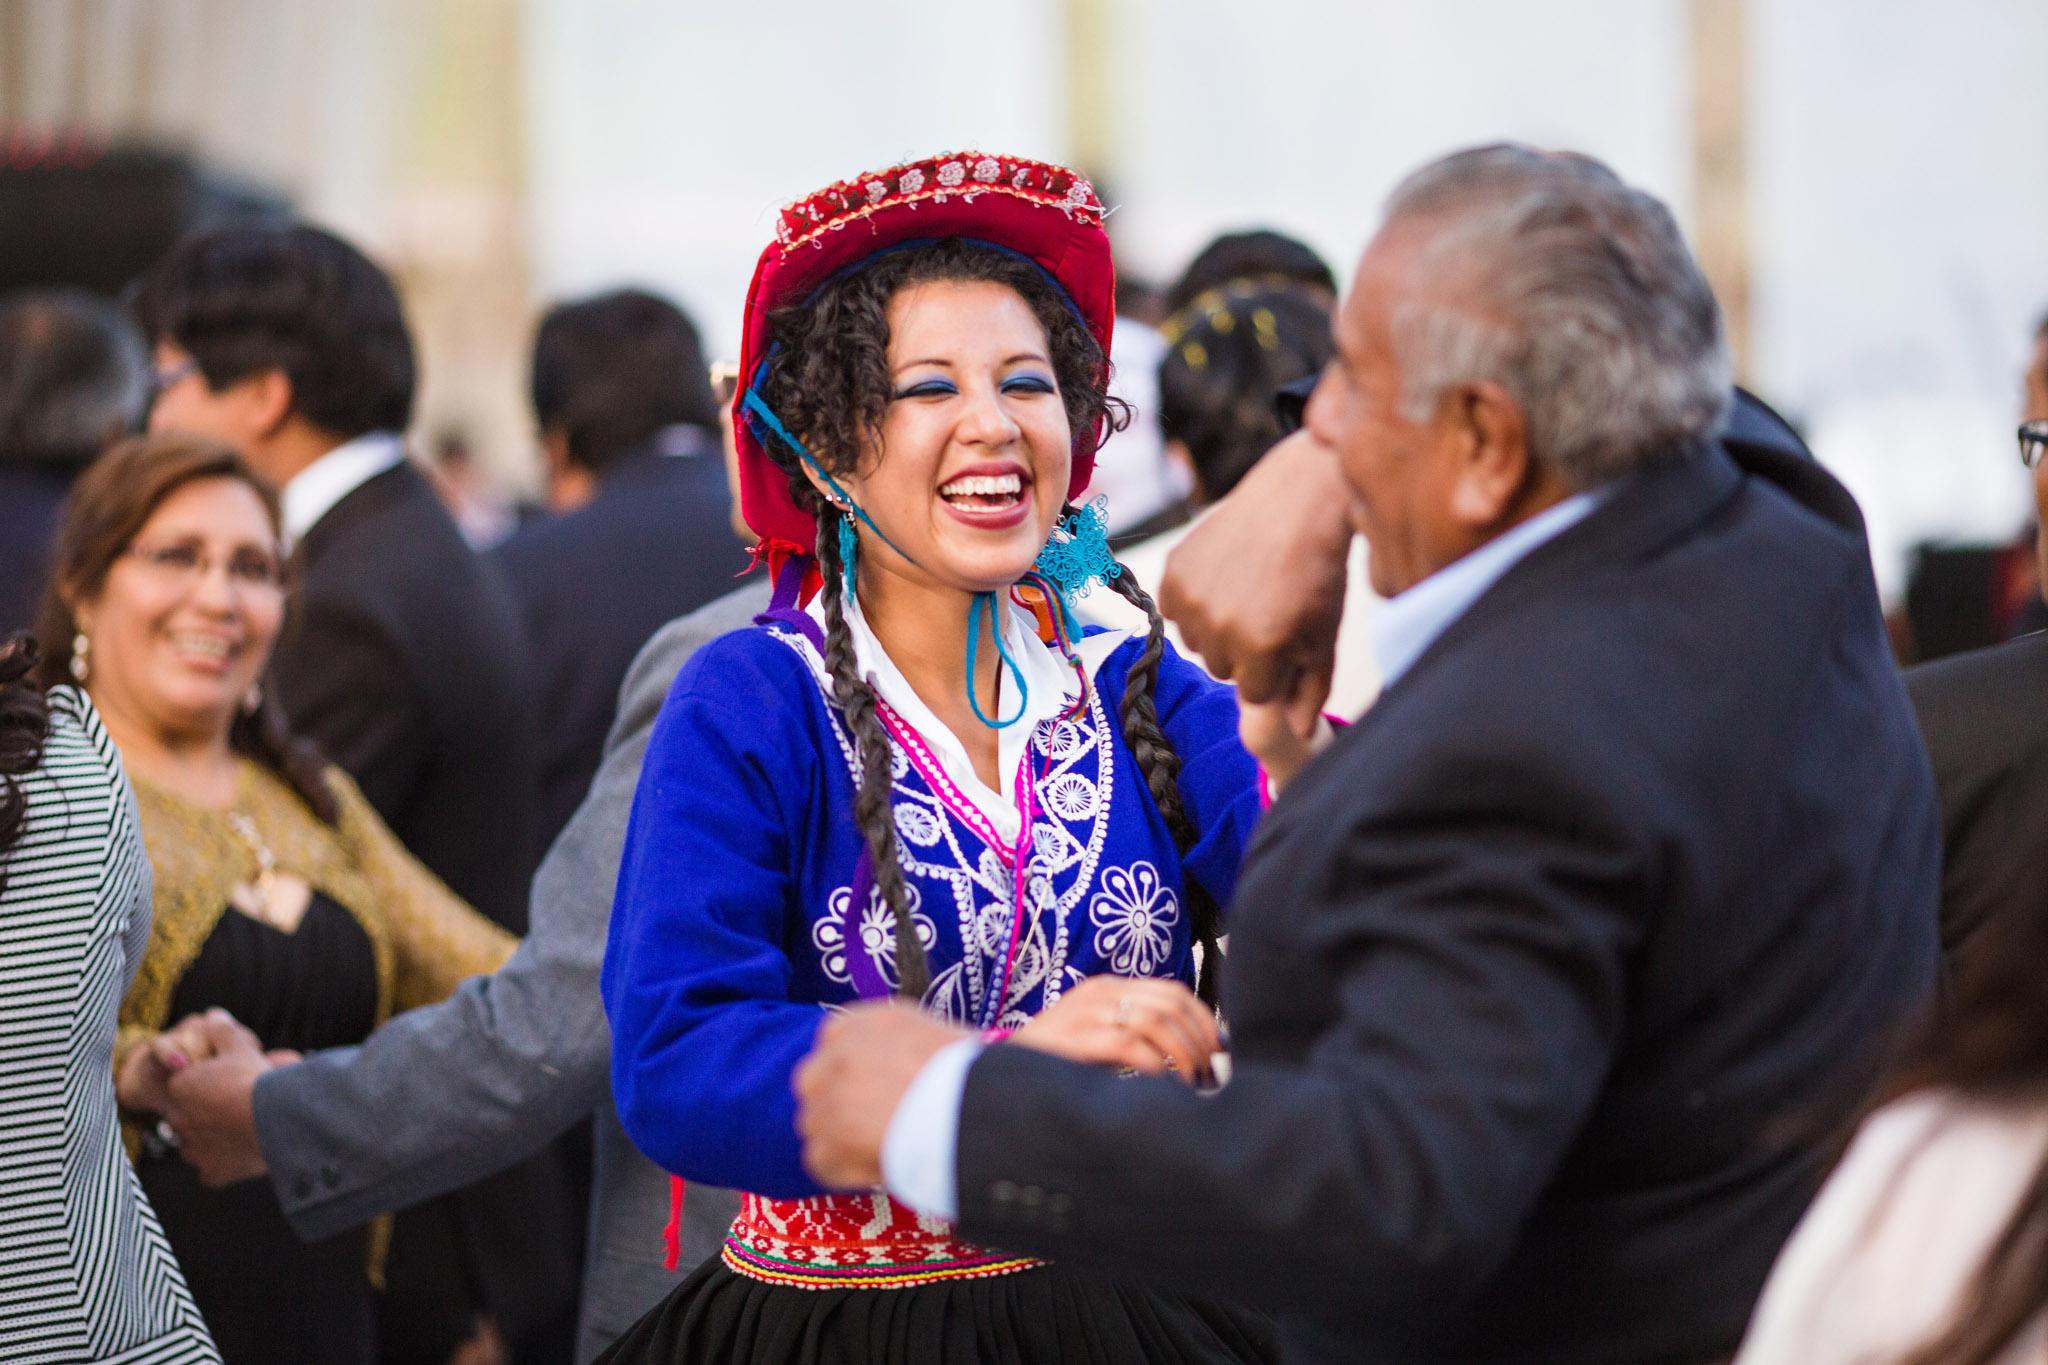 Wedding-Travellers-Destination-Wedding-Peru-Cusco-Hacienda-Sarapampa-Sacred-Valley-traditional-costumes-party